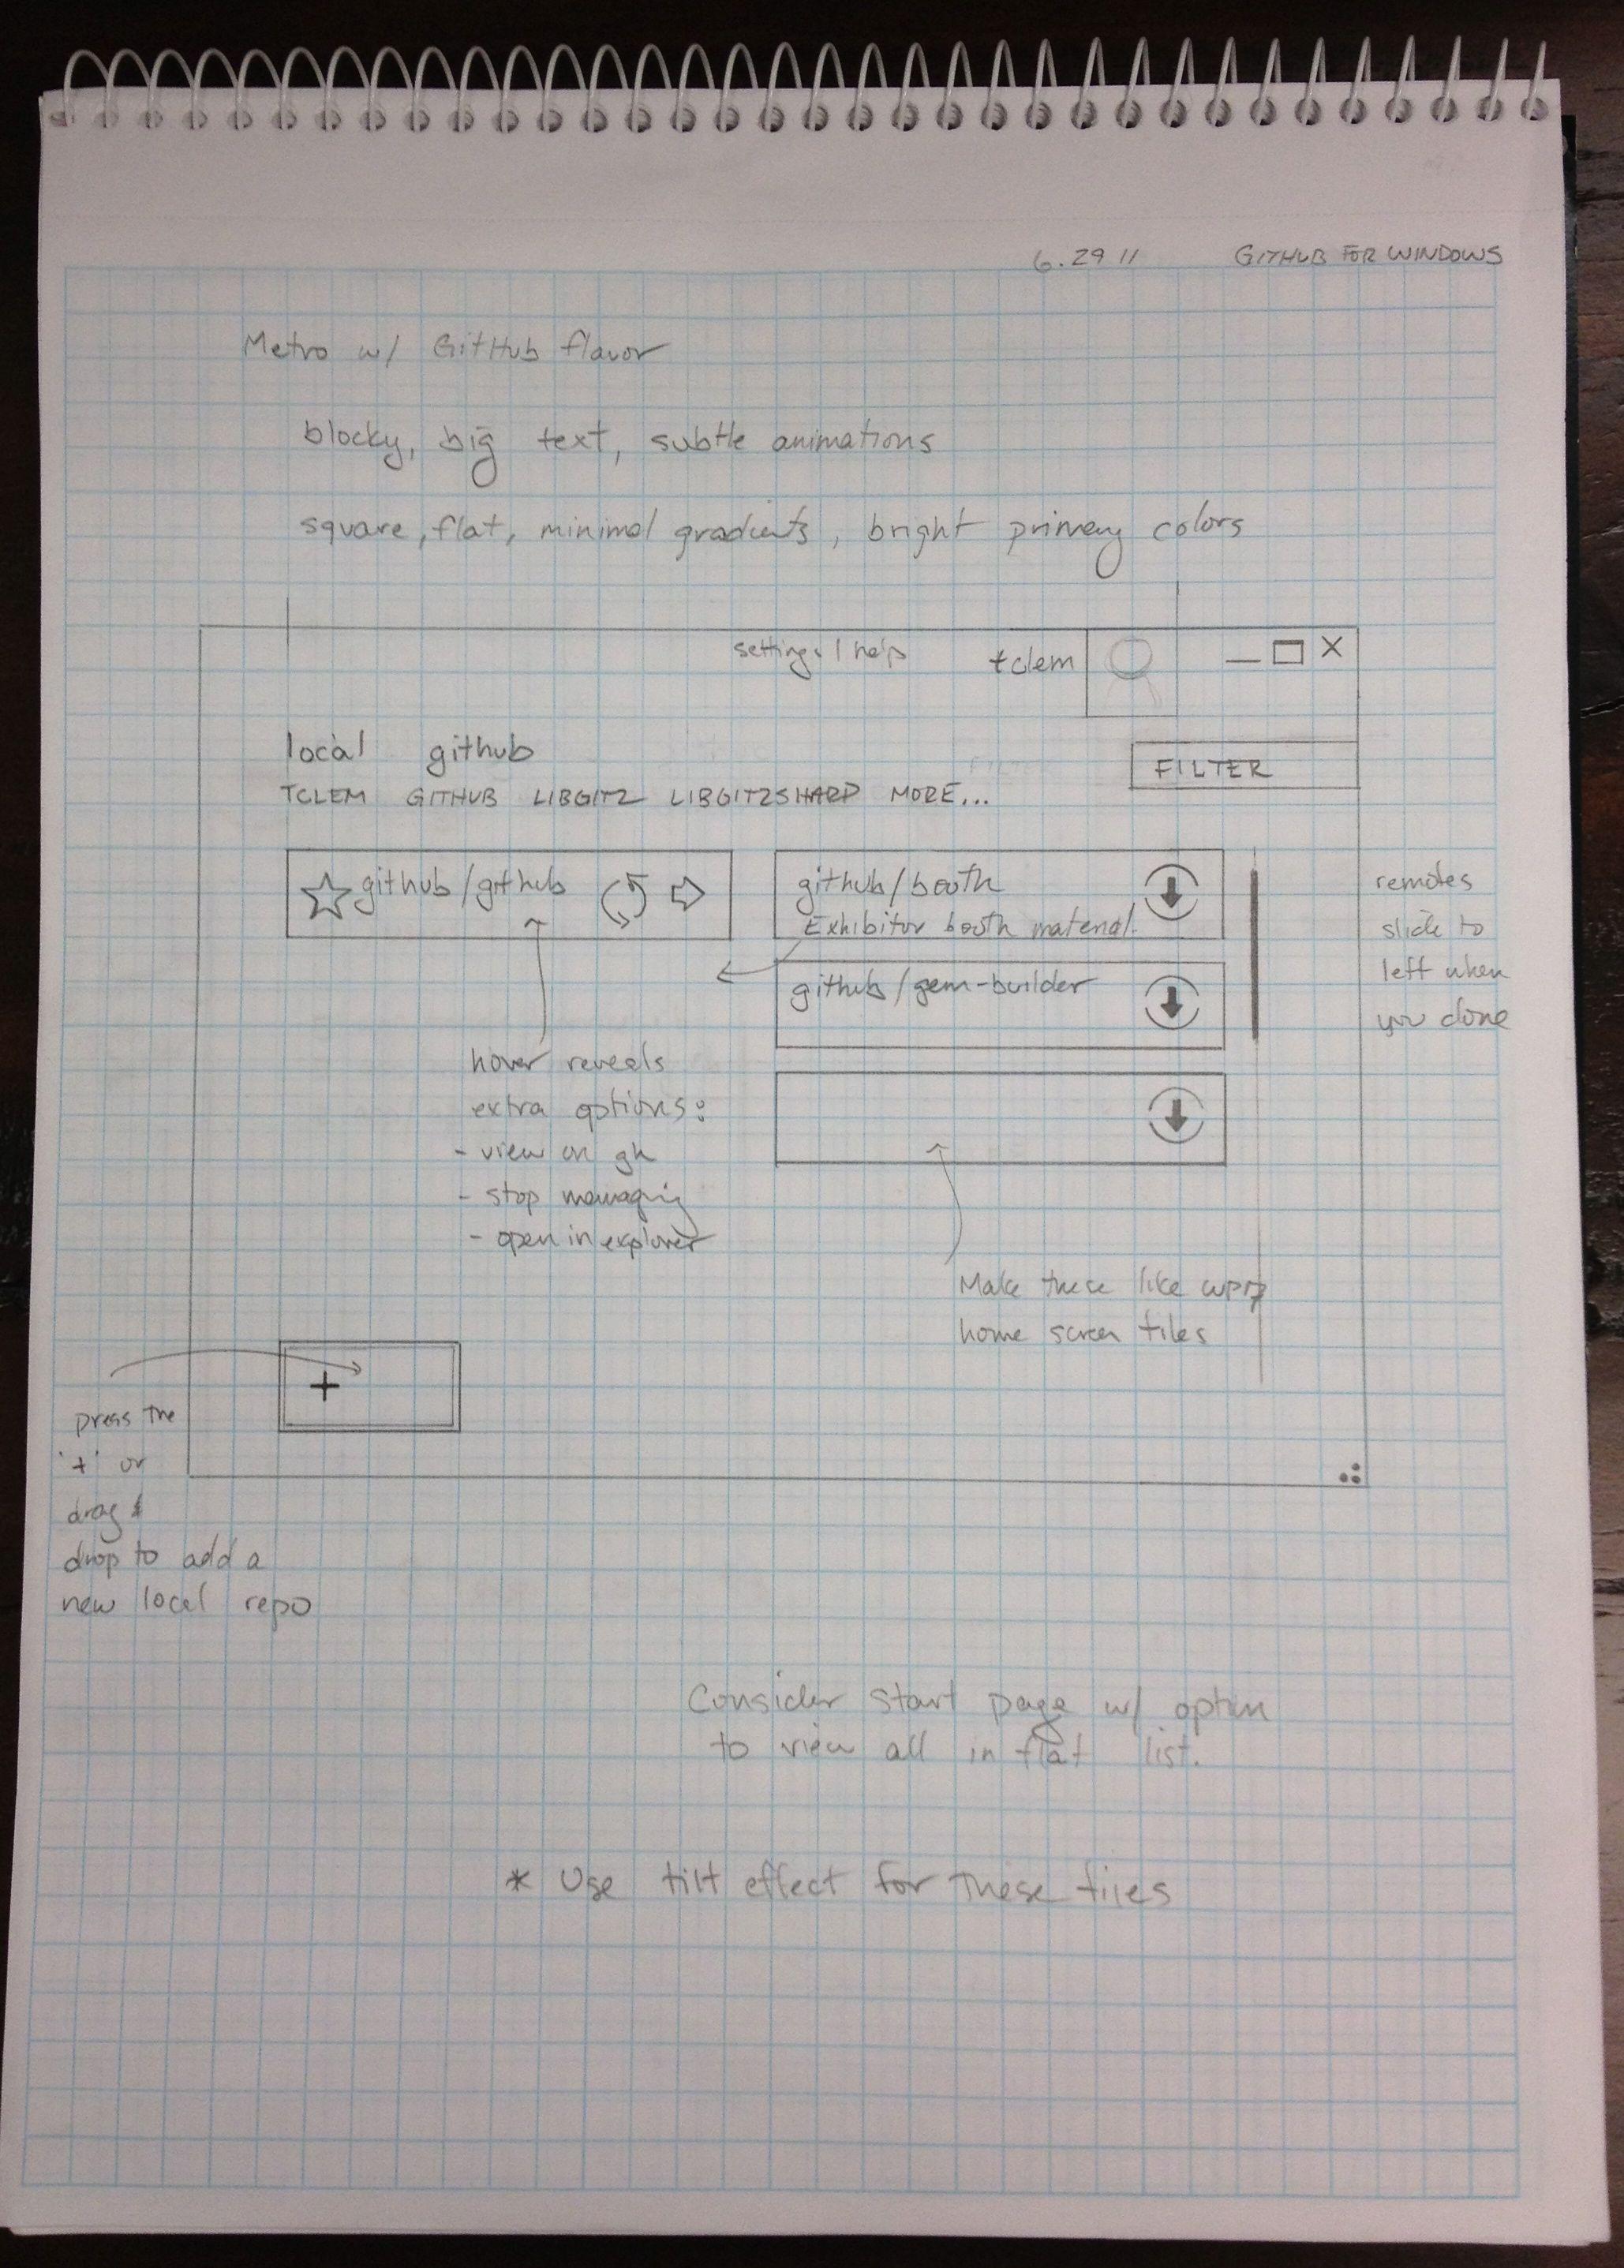 Designing GitHub for Windows - The GitHub Blog